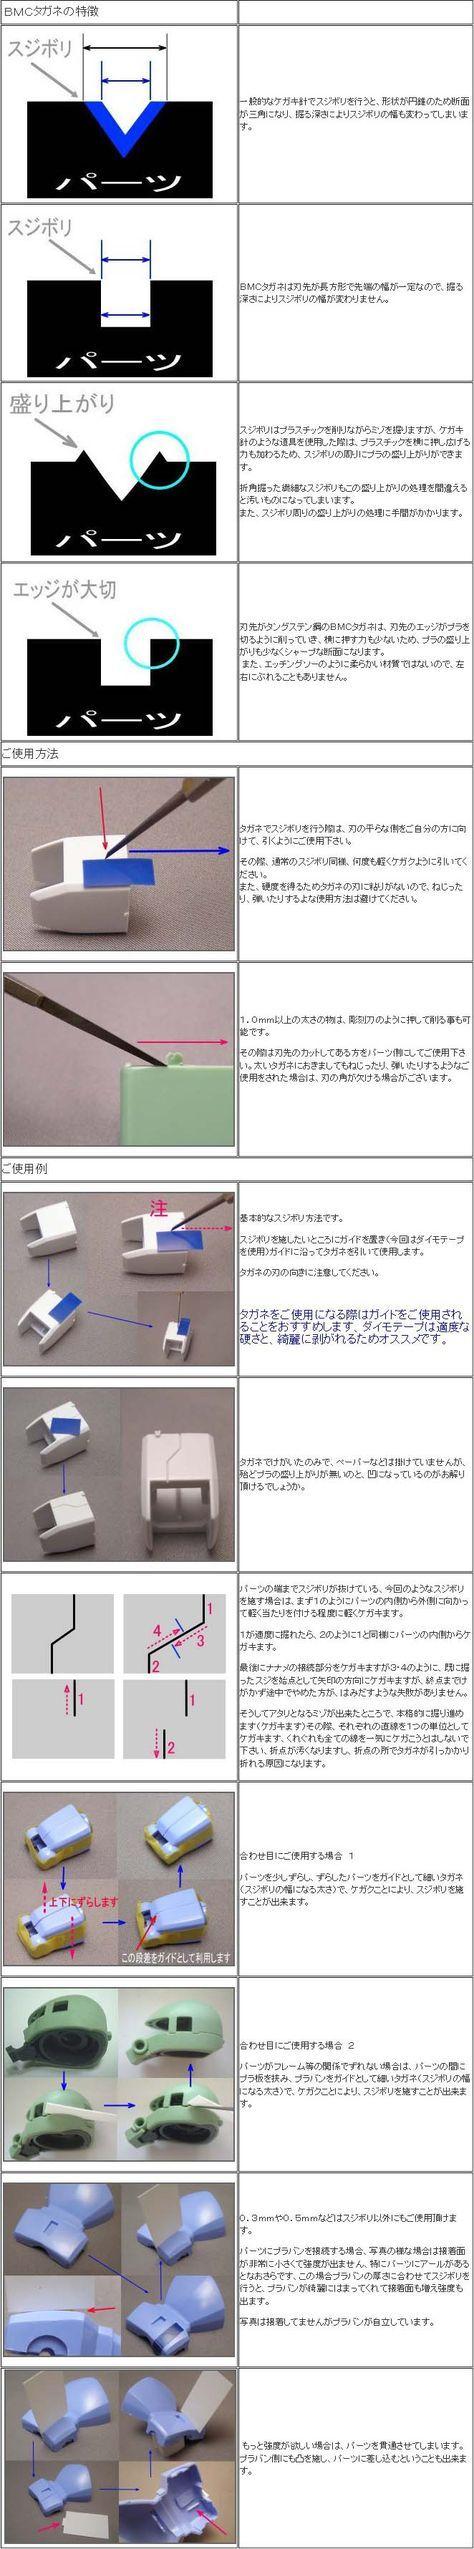 日本スジボリ堂 BMC精密刻刀 刀刃厚度3mm [T-300]-淘宝网全球站